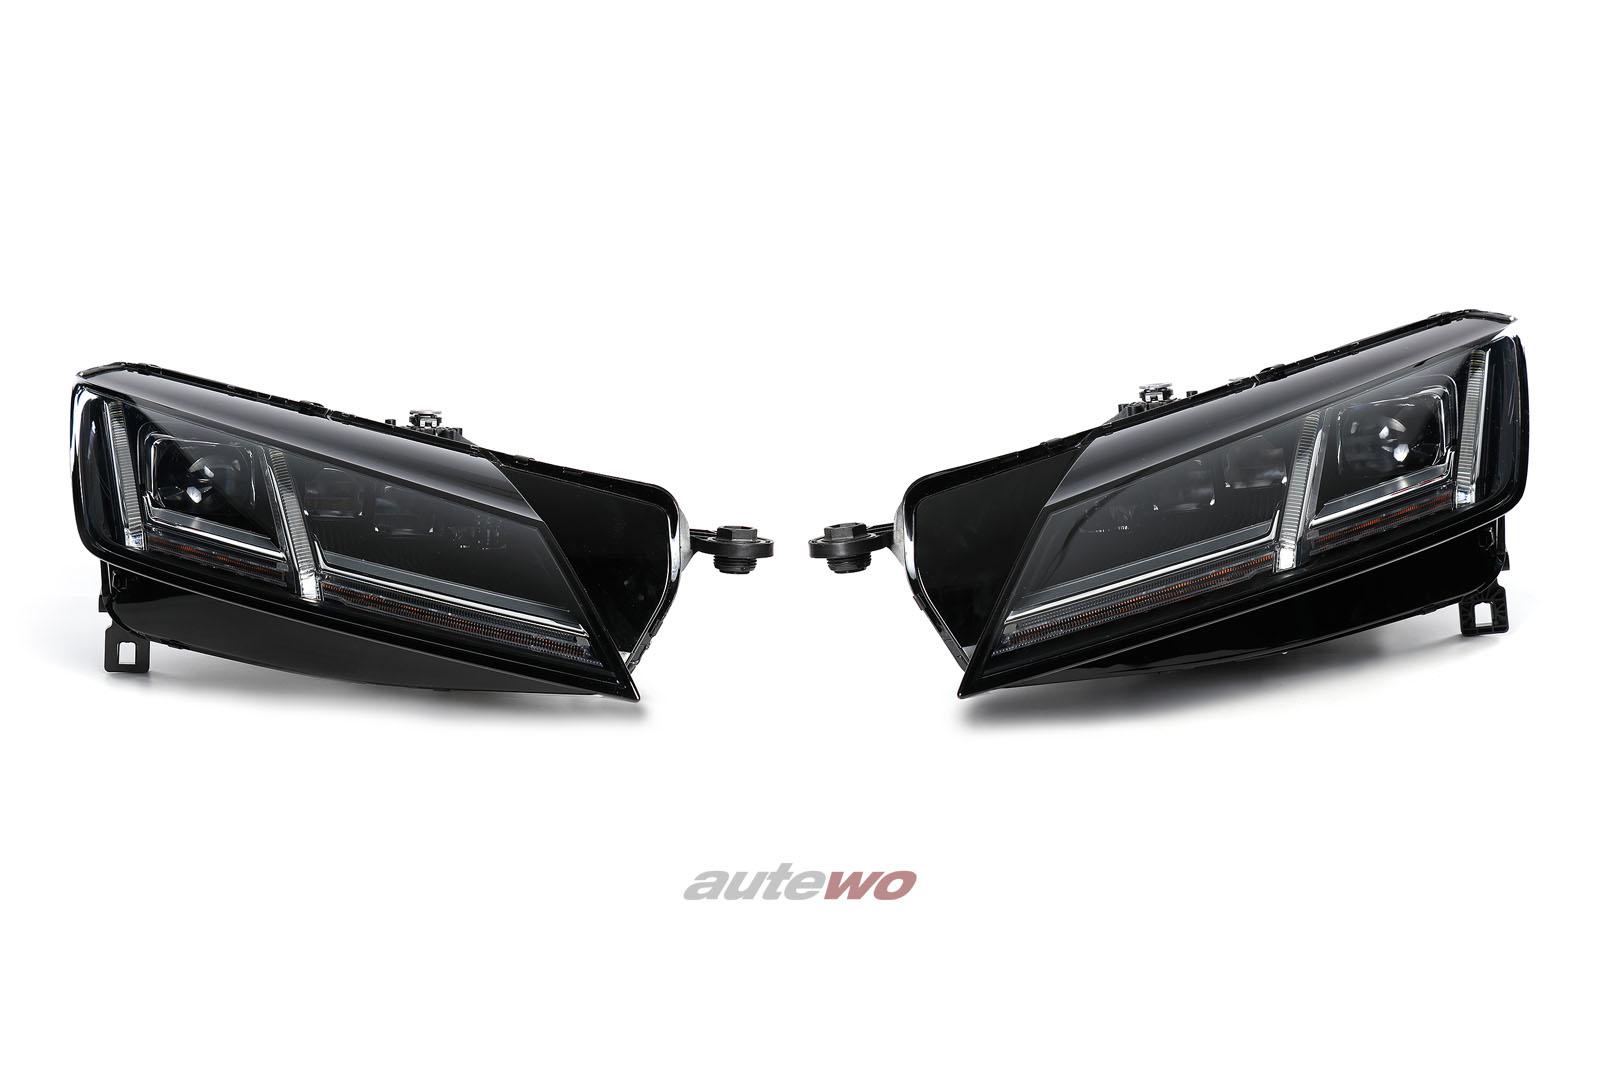 8S0941035/036 8S0941783B/784B Audi TT/TTS/TTRS 8S LED Scheinwerfer Matrix Beam